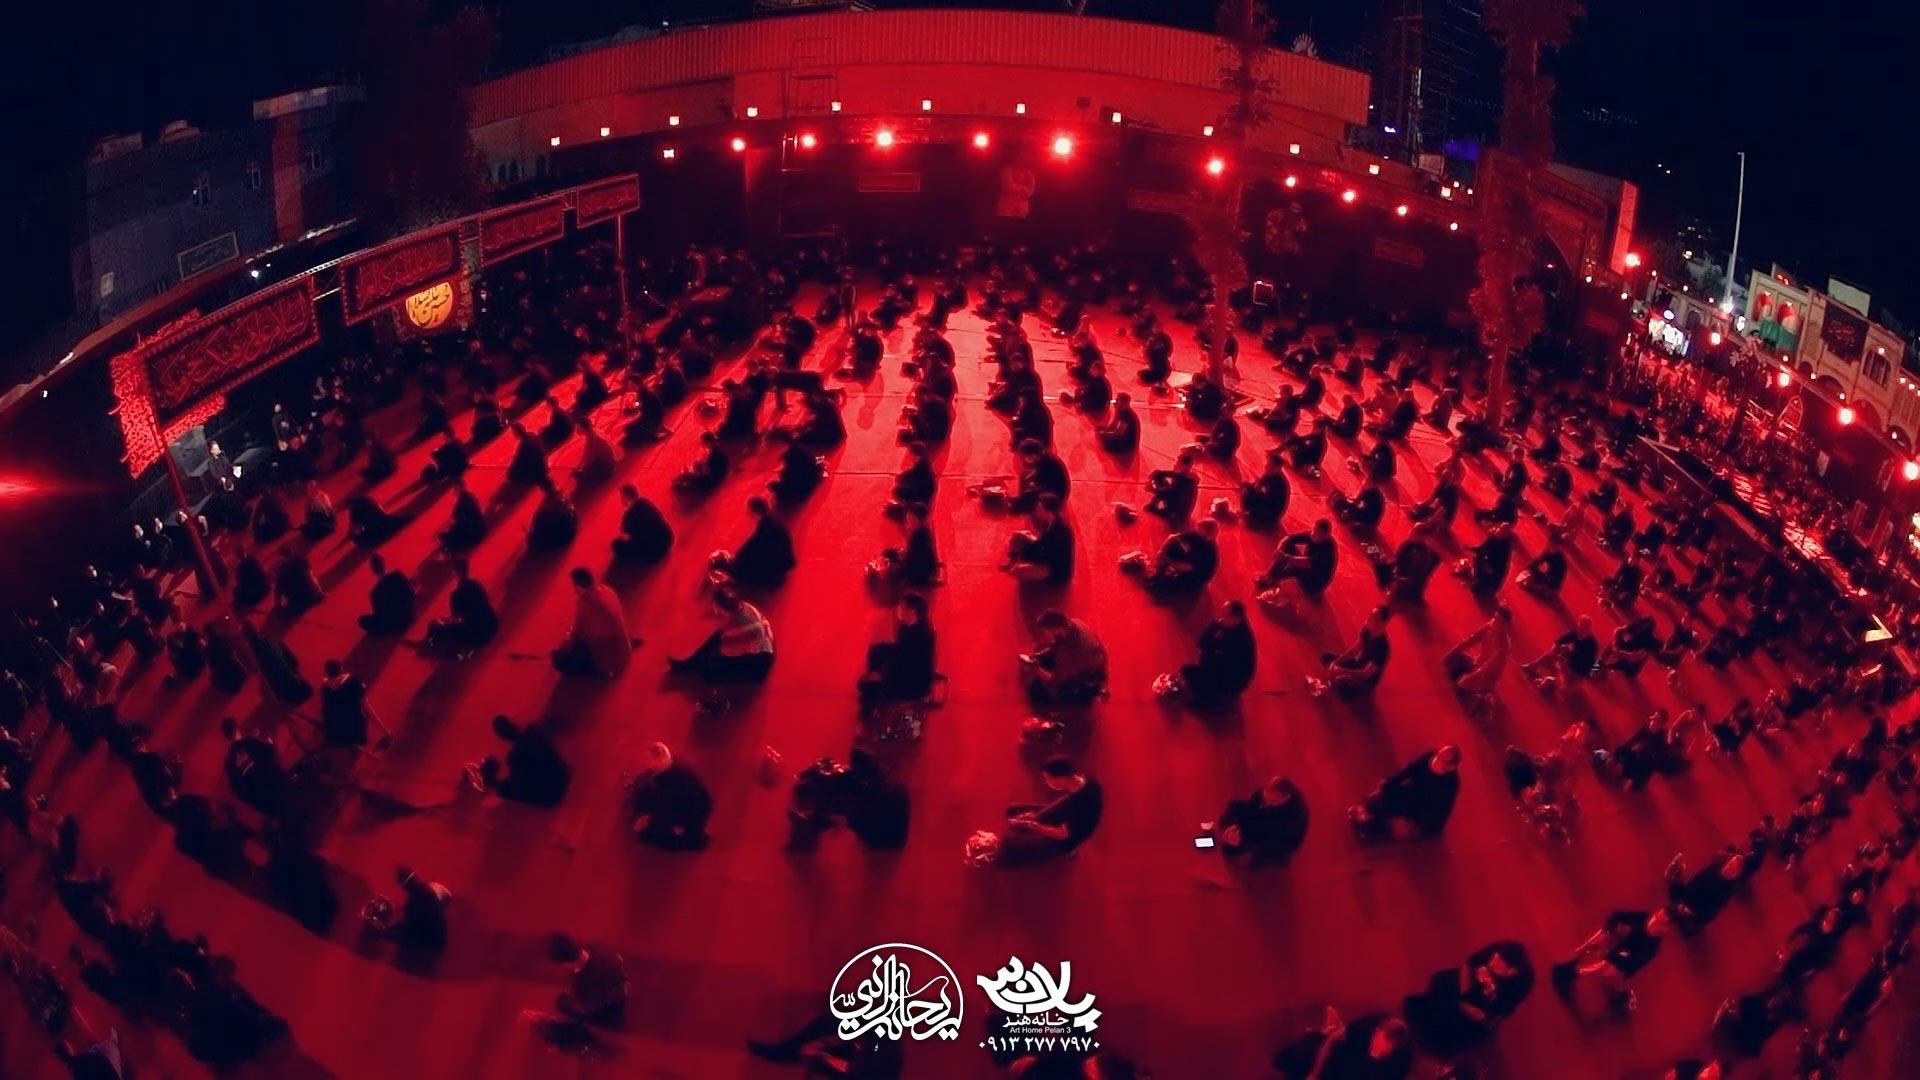 faghiram-mohammad-hosein-poyanfar